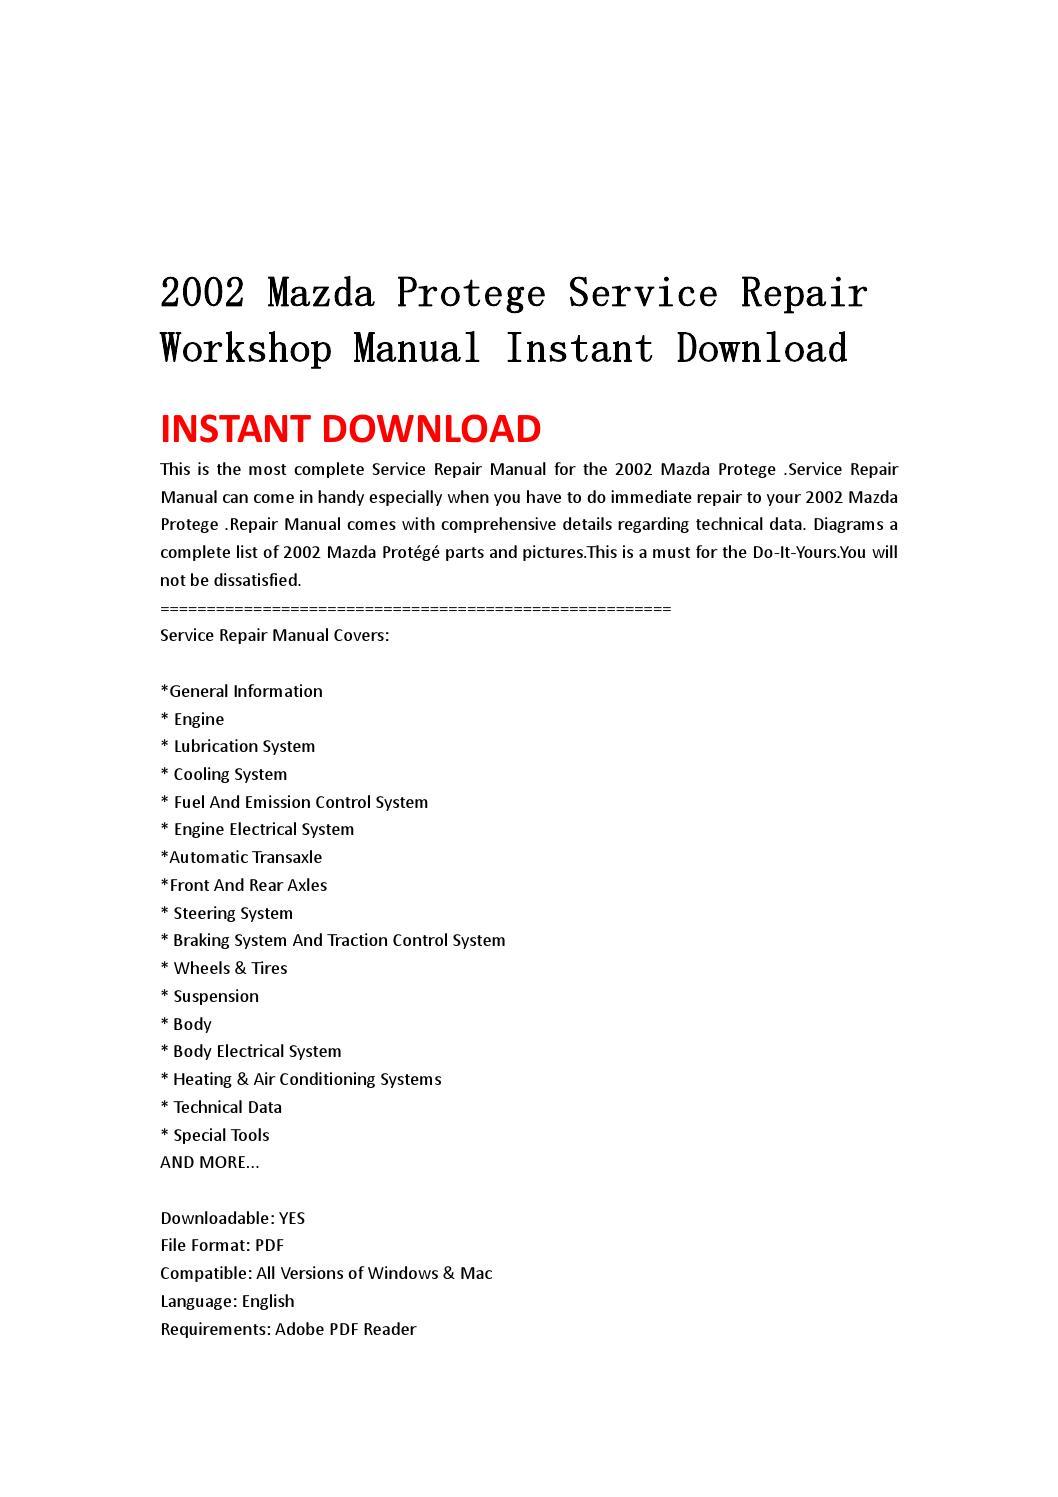 Mazda Protege Workshop Manual L DOHC PDF